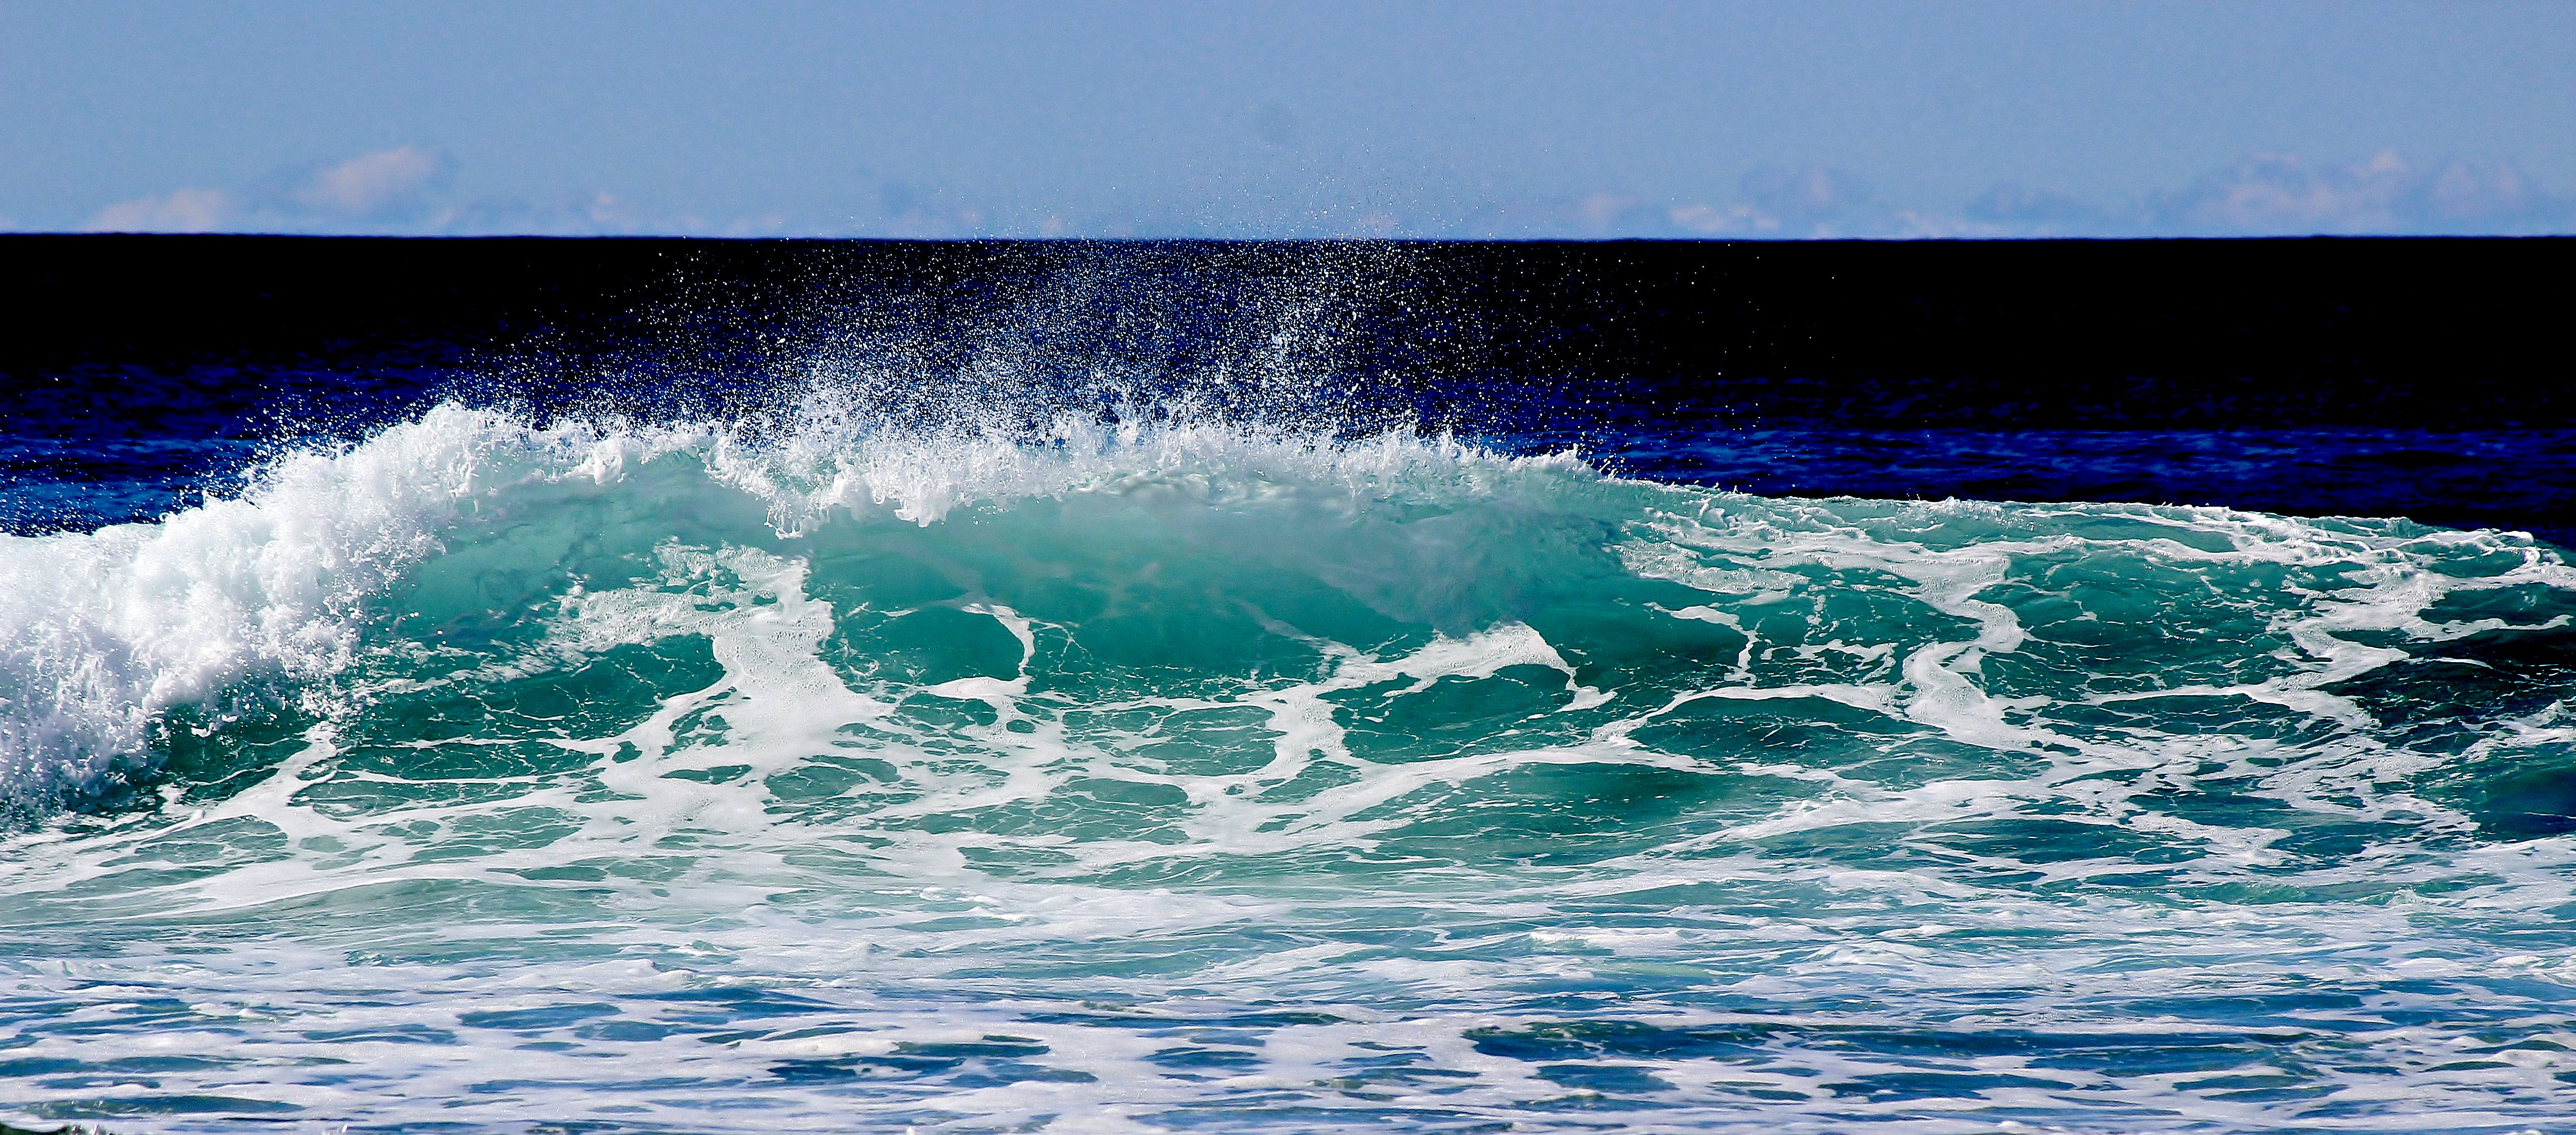 Free stock photo of beach, Blue ocean, ocean, pacific